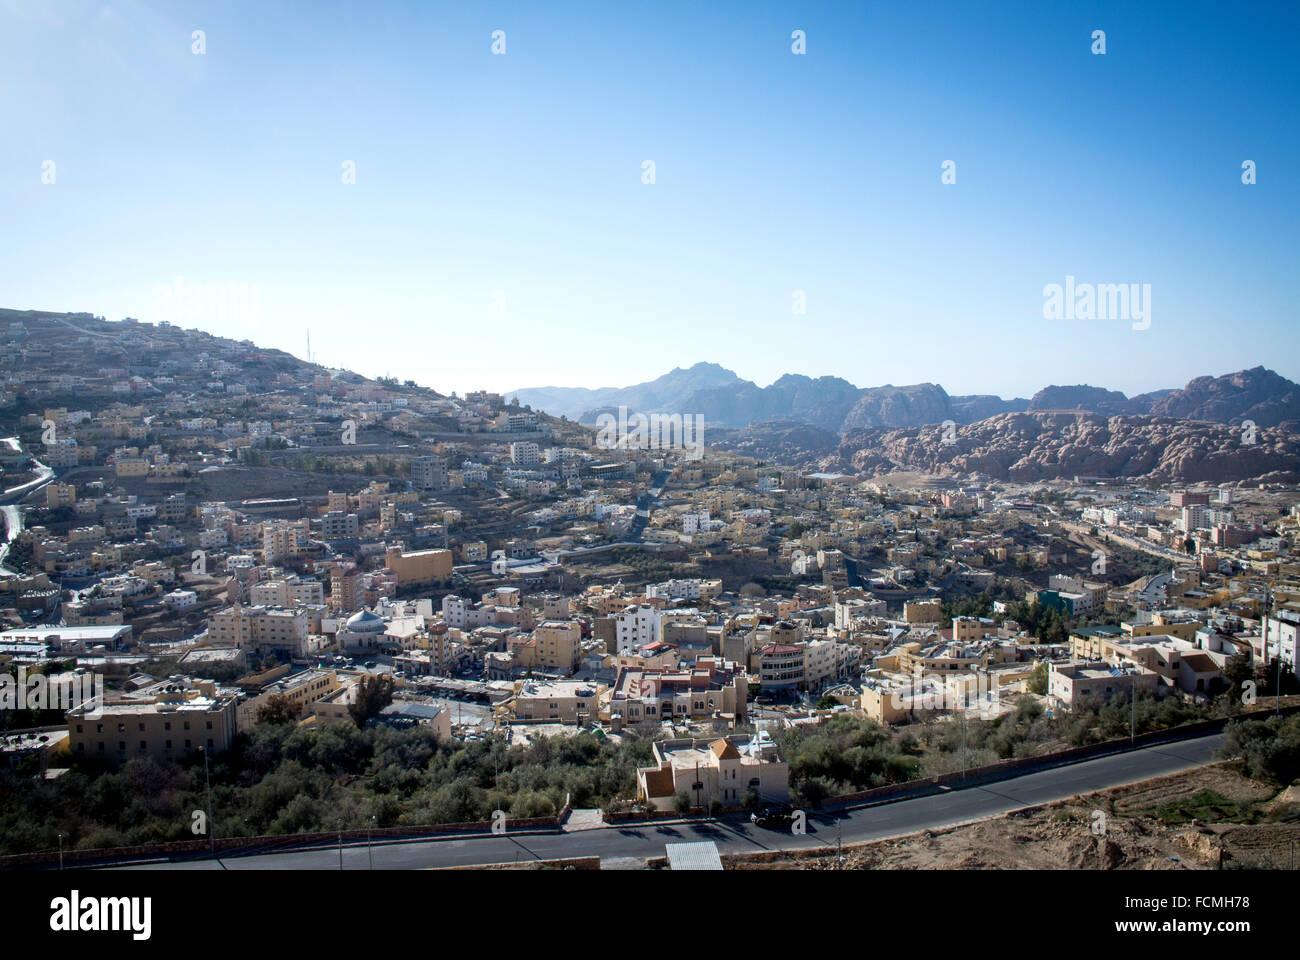 The town of Wadi Musa the gateway to Petra, Jordan - Stock Image